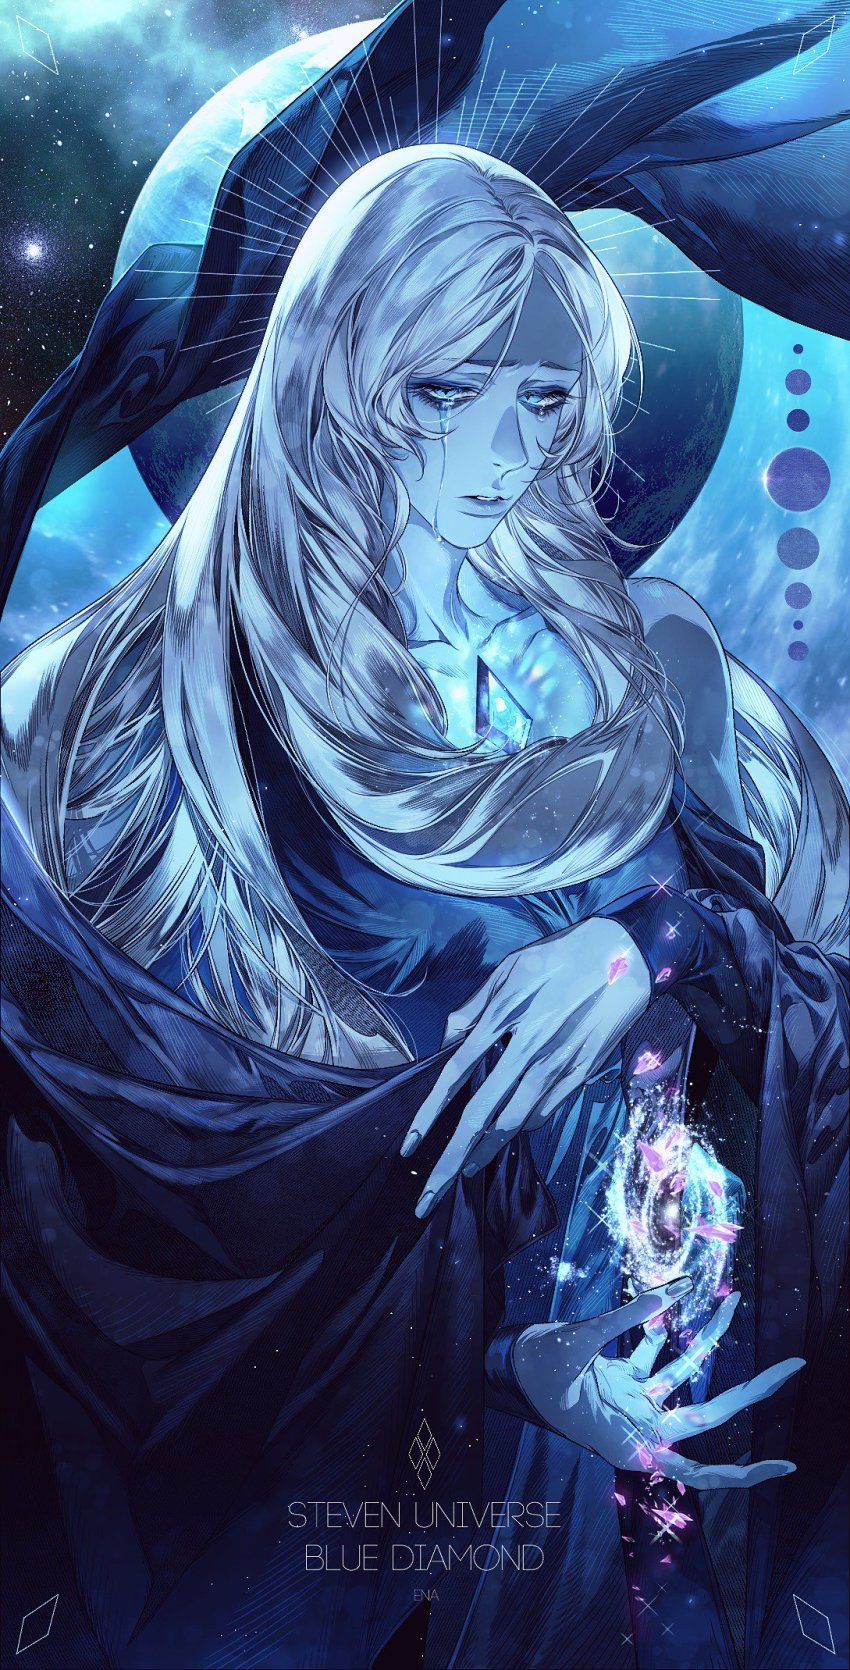 1girl blue_diamond_steven_universe blue_dress blue_eyes